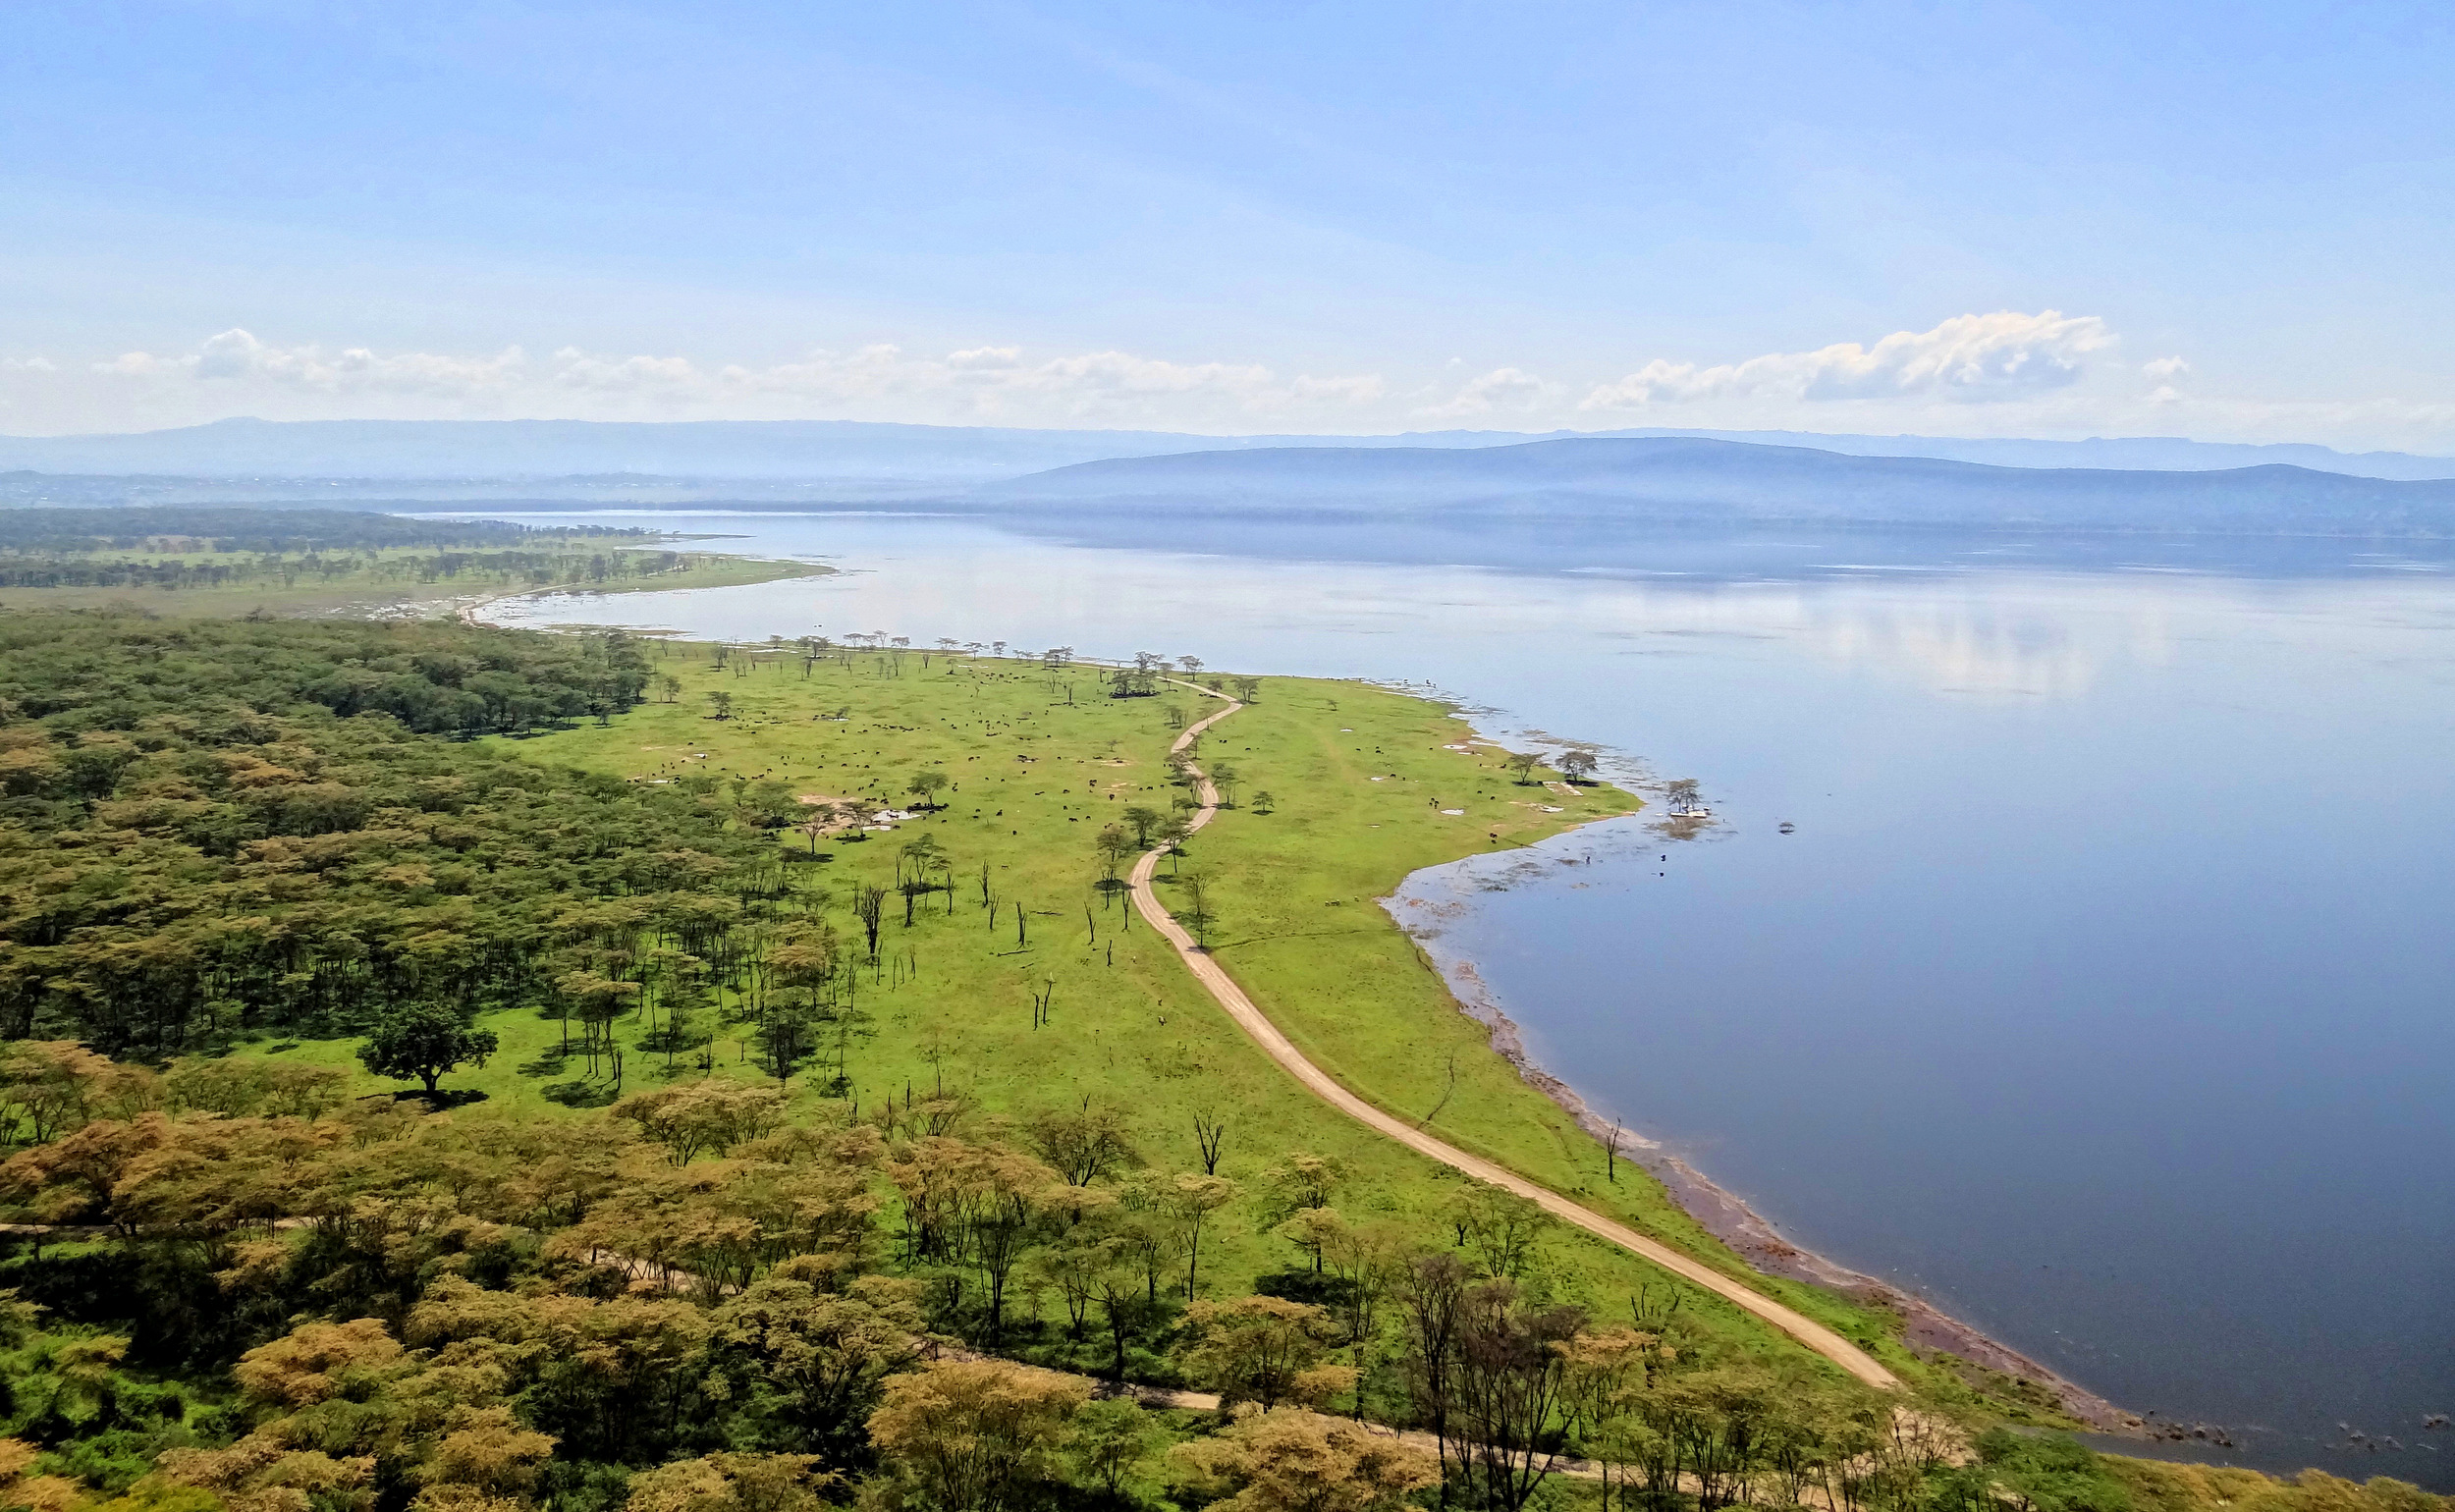 Lake-Nakuru-Baboon-Hill-View.JPG